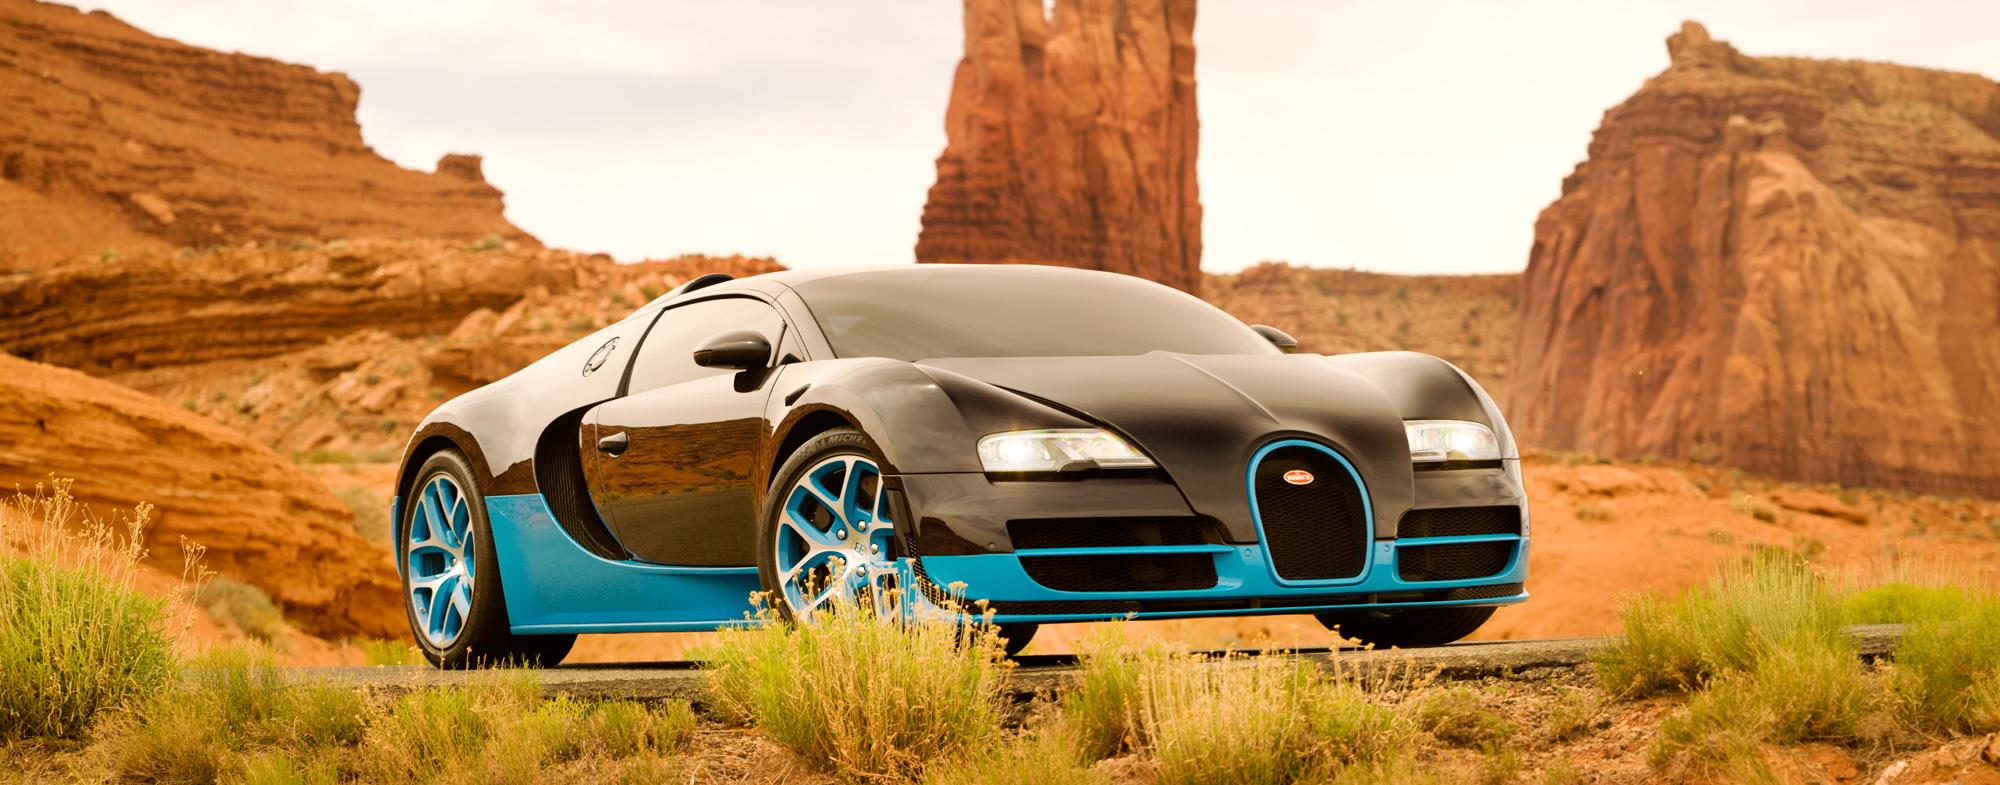 transformers4-Bugatti-Veyron-drift-sucks